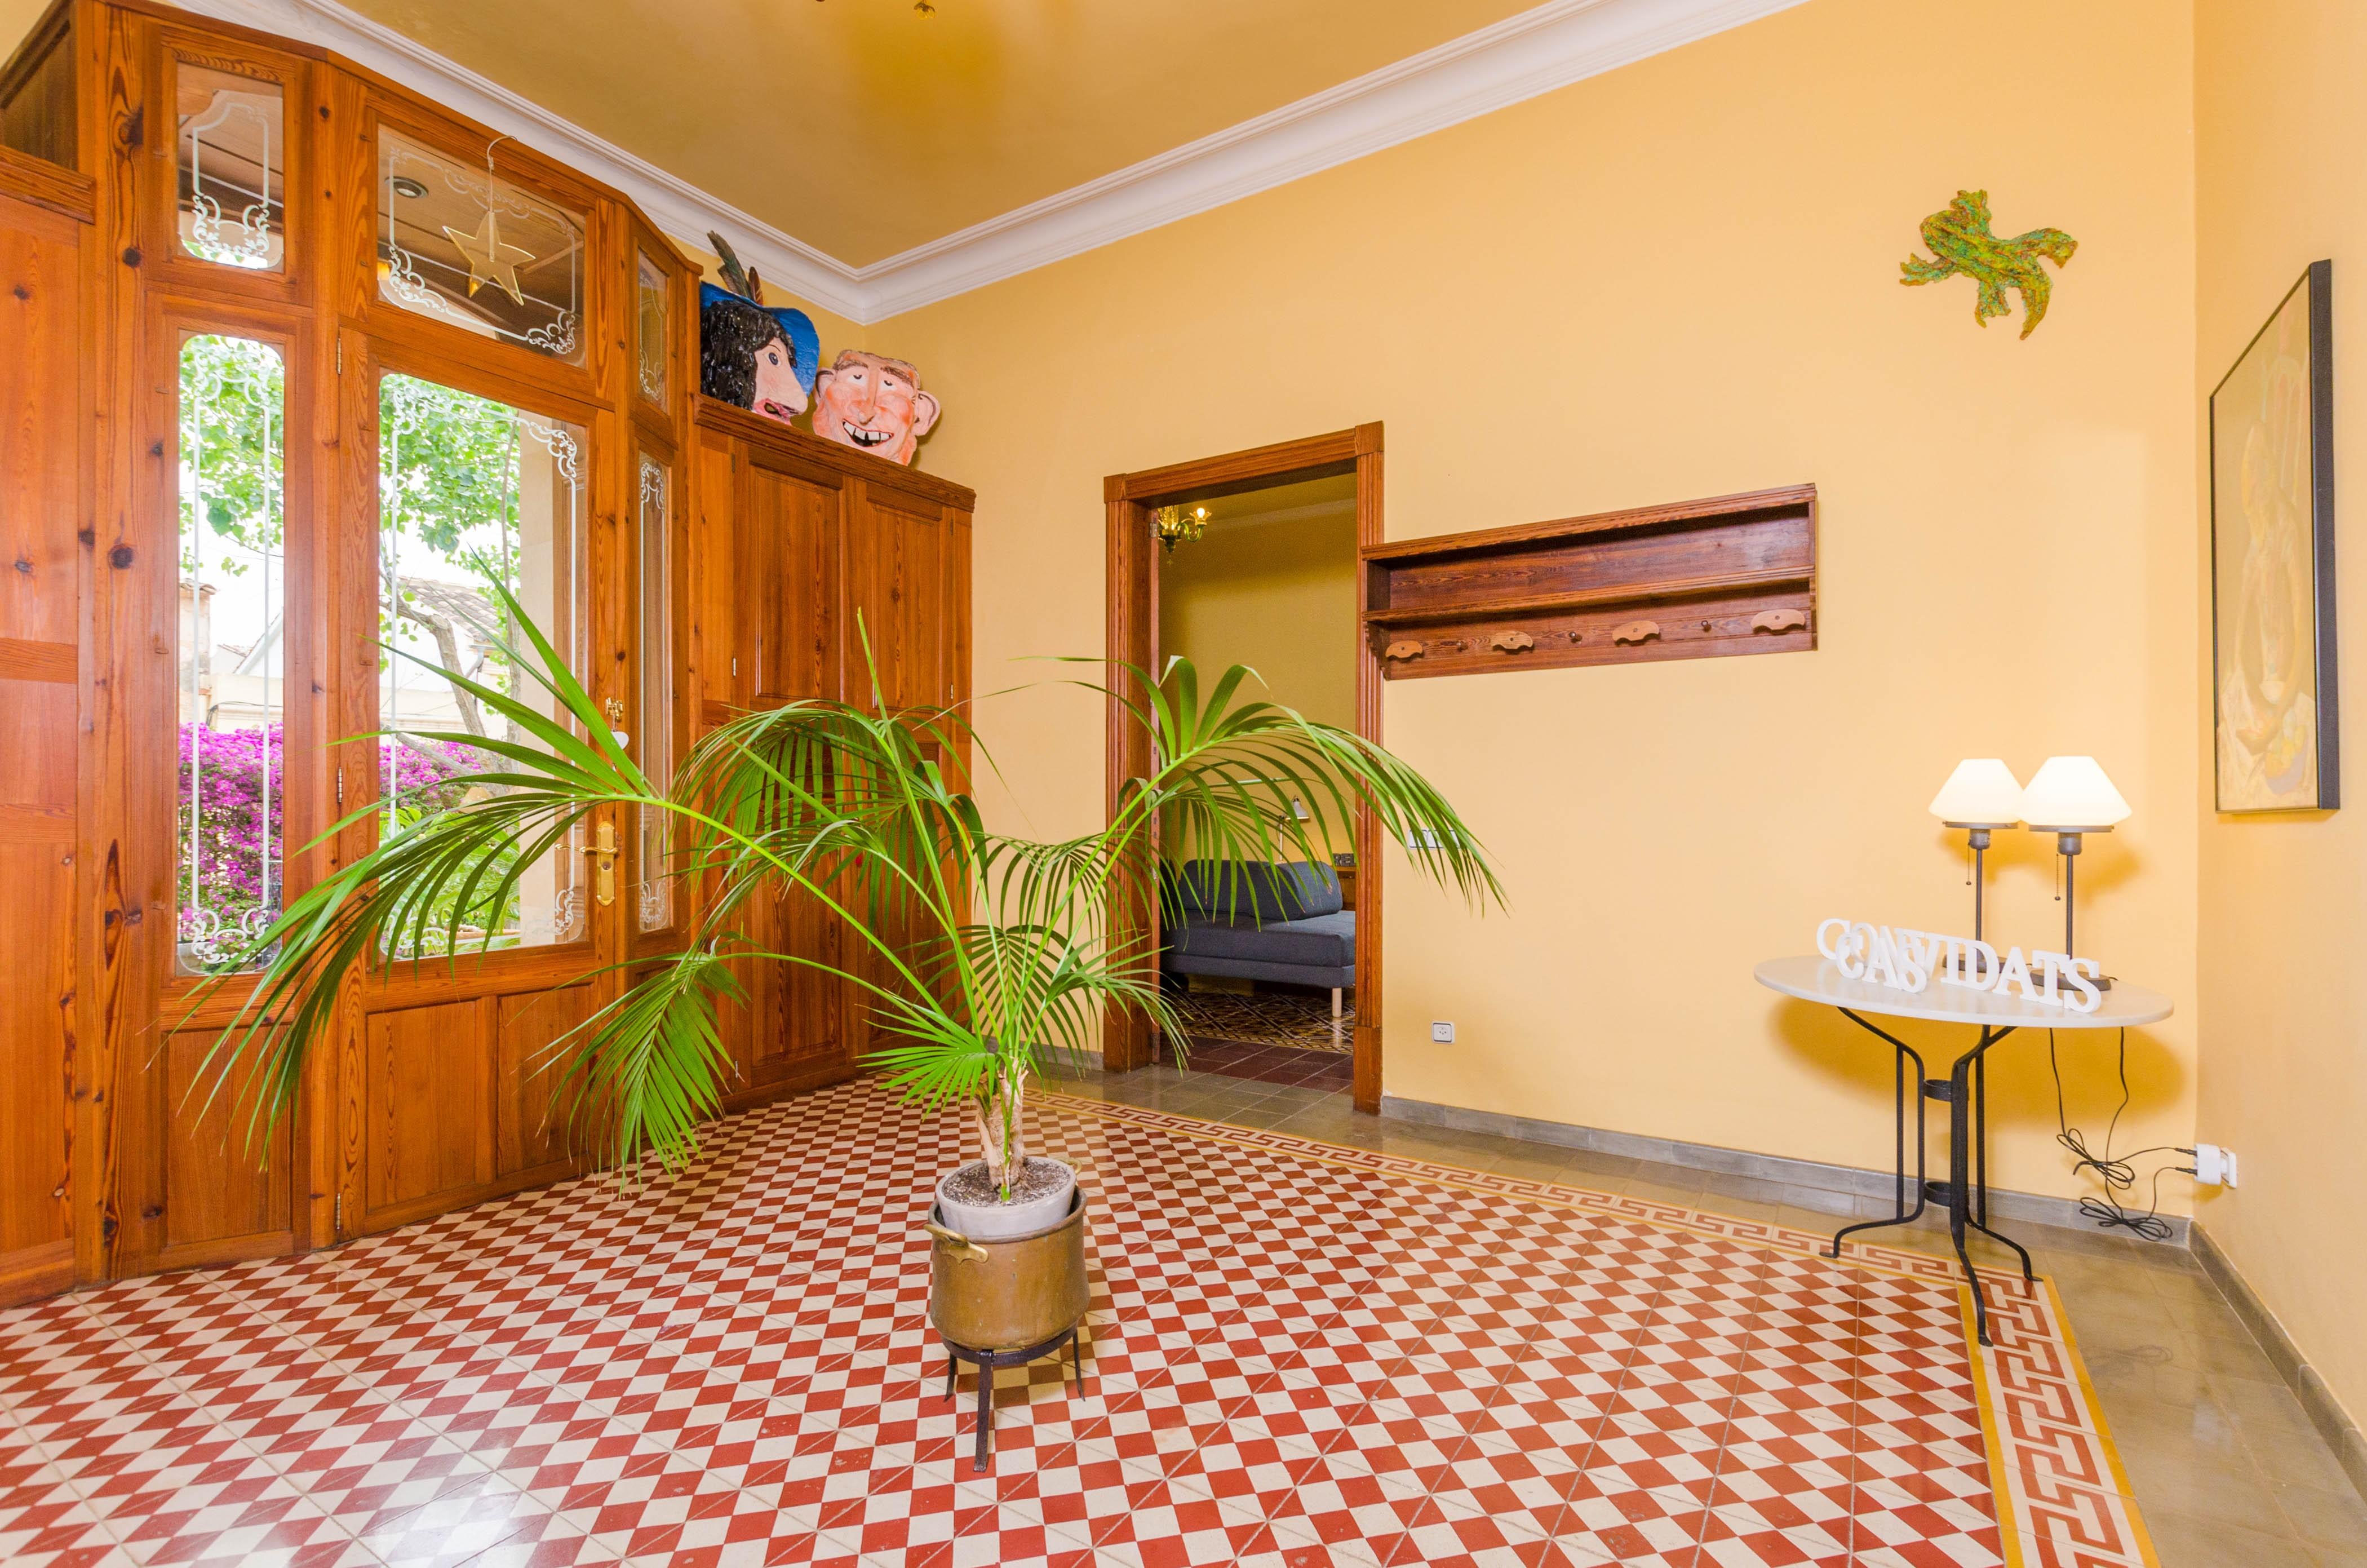 Maison de vacances CAS CONVIDATS (2435013), Alaro, Majorque, Iles Baléares, Espagne, image 37